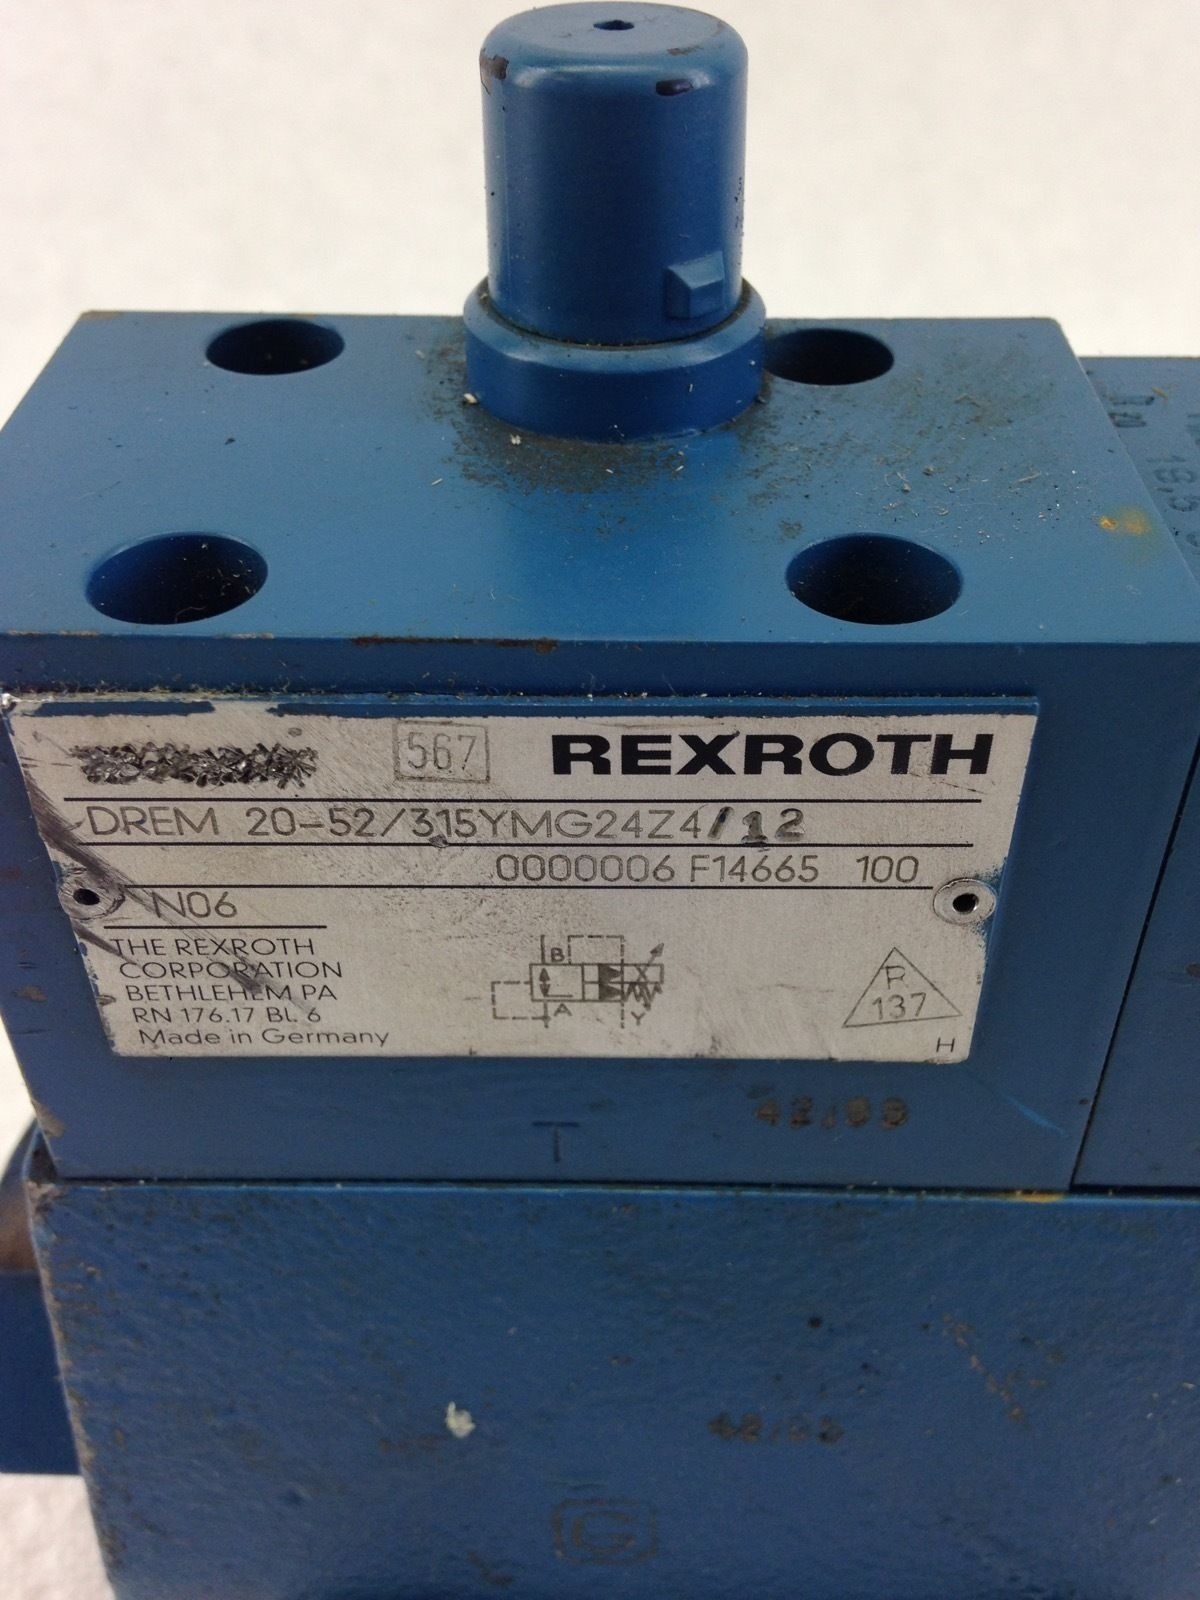 NEW REXROTH SOLENOID VALVE DREM 20-52 315YMG24Z4/12 PRESSURE REDUCING VALVE B387 2